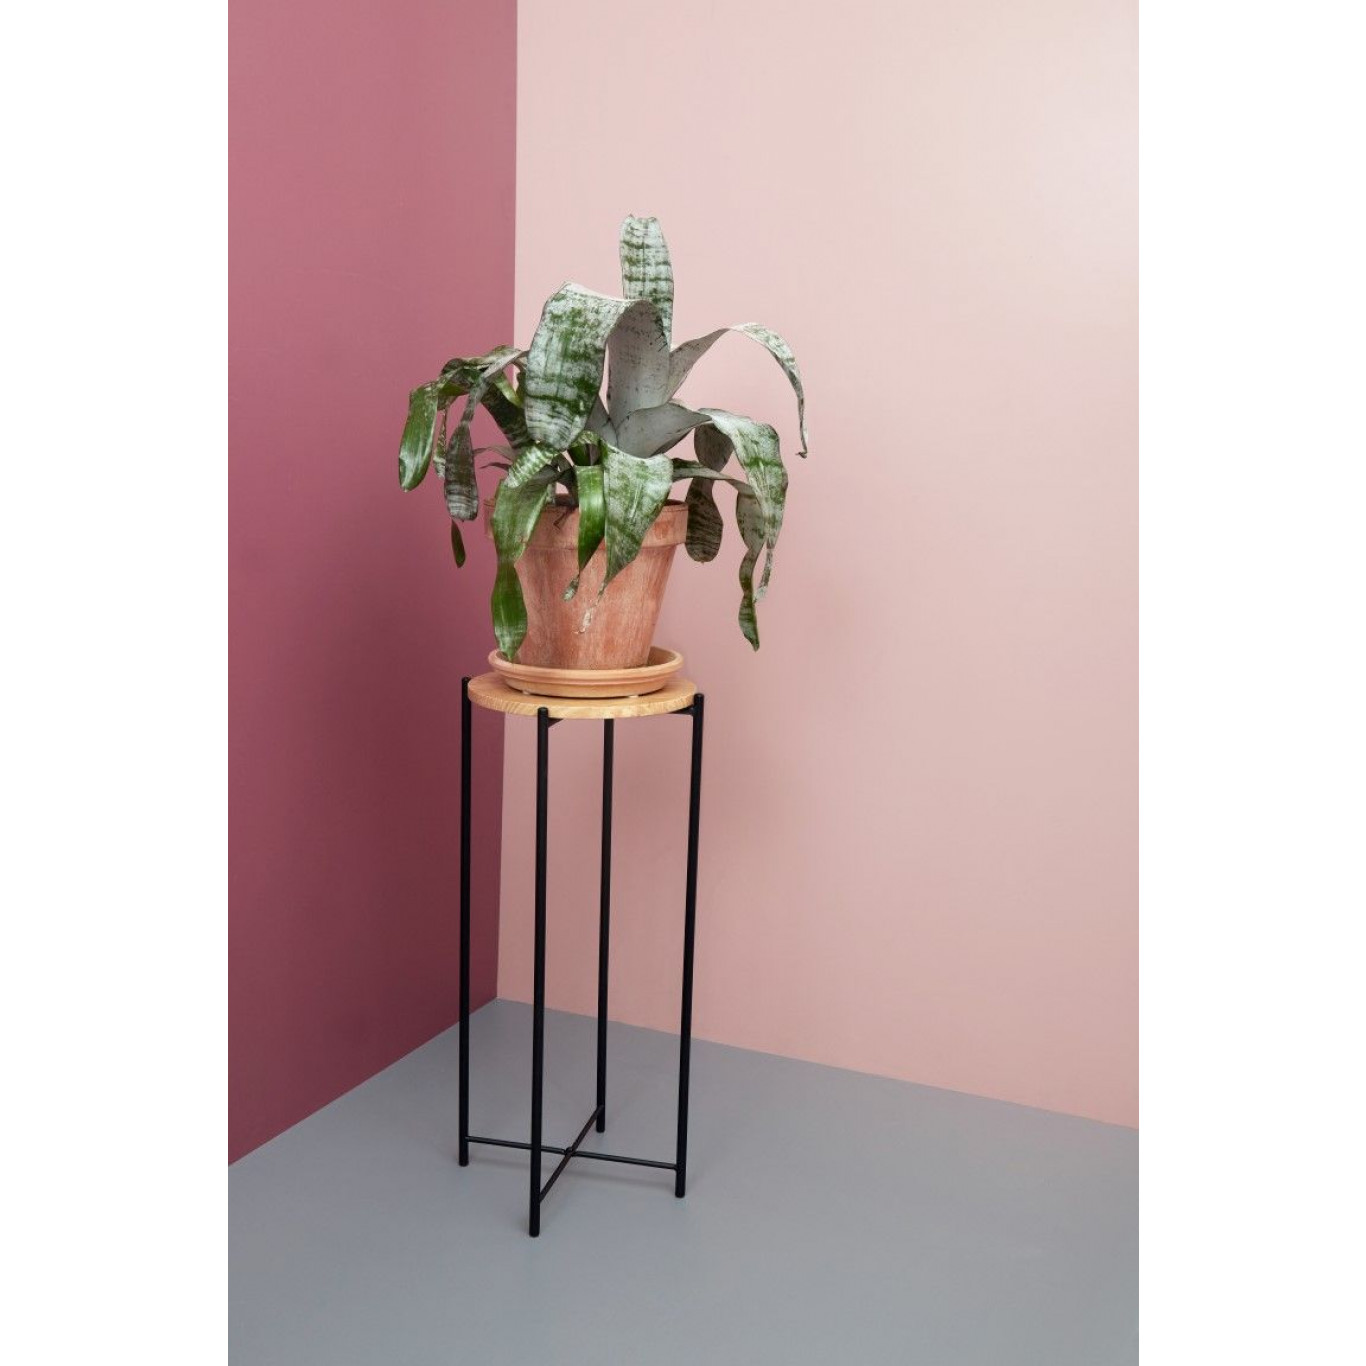 Flower Stand & Table | Ø 30 x 70 cm